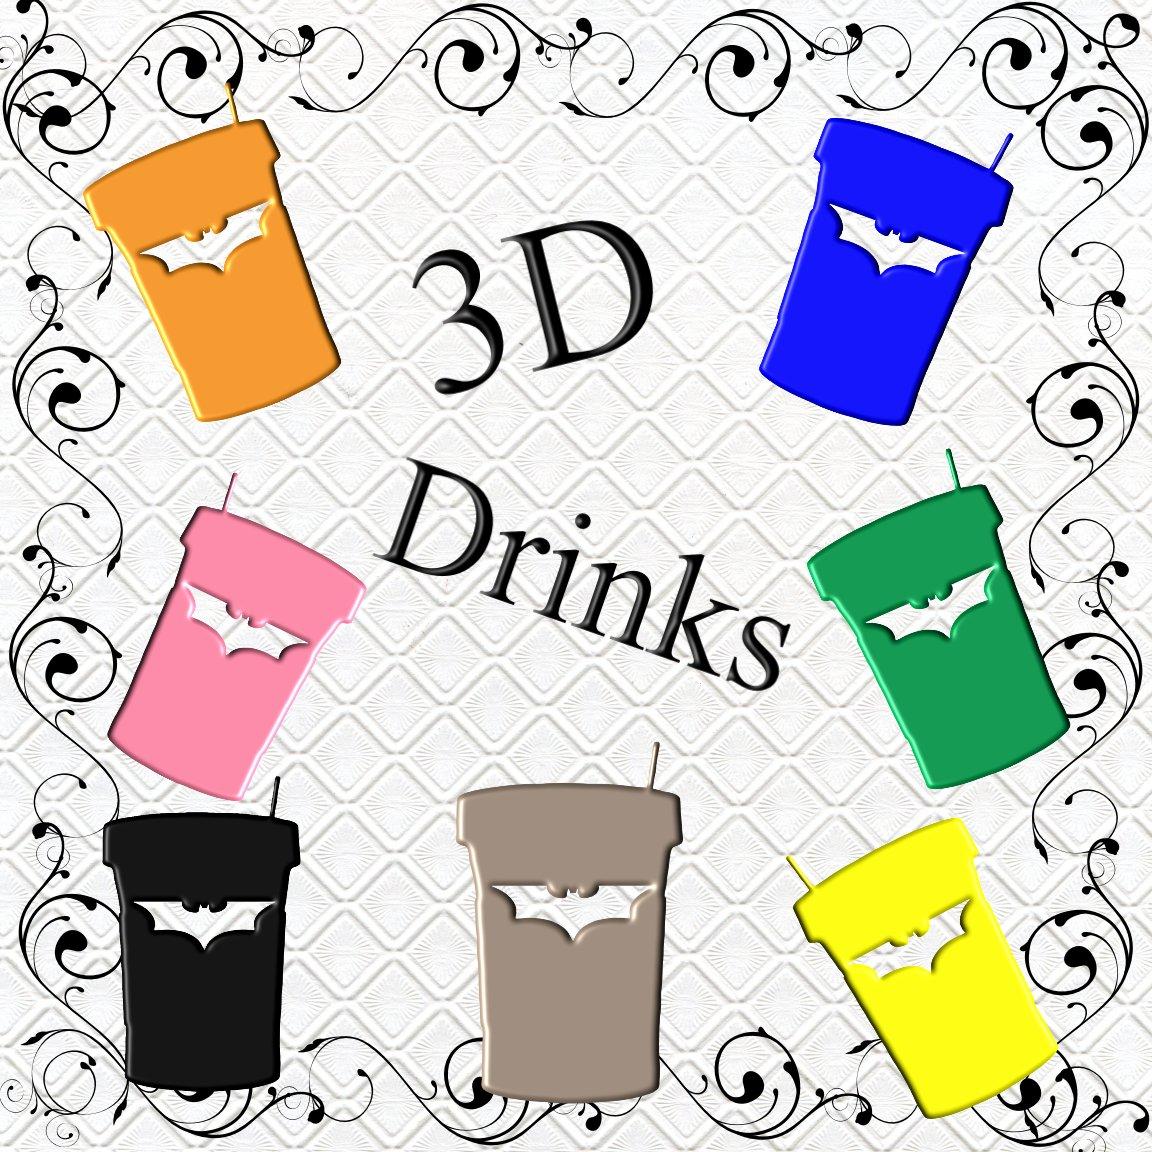 Color 3D Drinks 3-Digital ClipArt-Gift Tag-Soft Drinks-Bat-Scrapbook-Banner-Background-Gift Card.